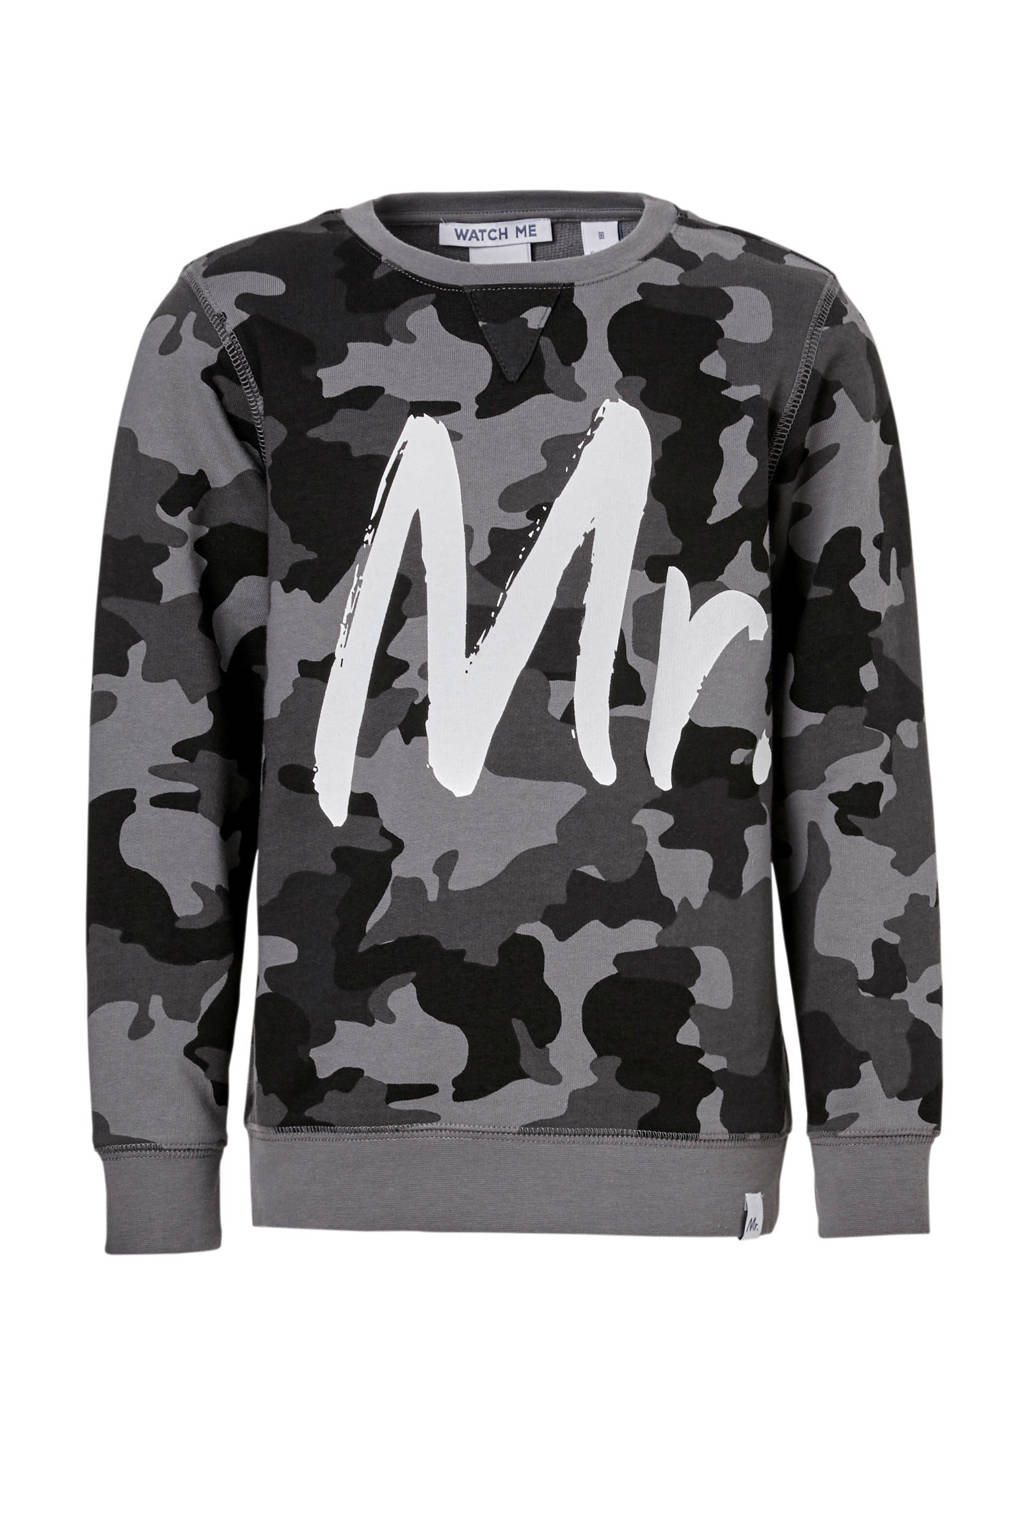 e7eb757e7d3 NIK&NIK sweater George met camouflageprint grijs, Grijs/zwart/wit